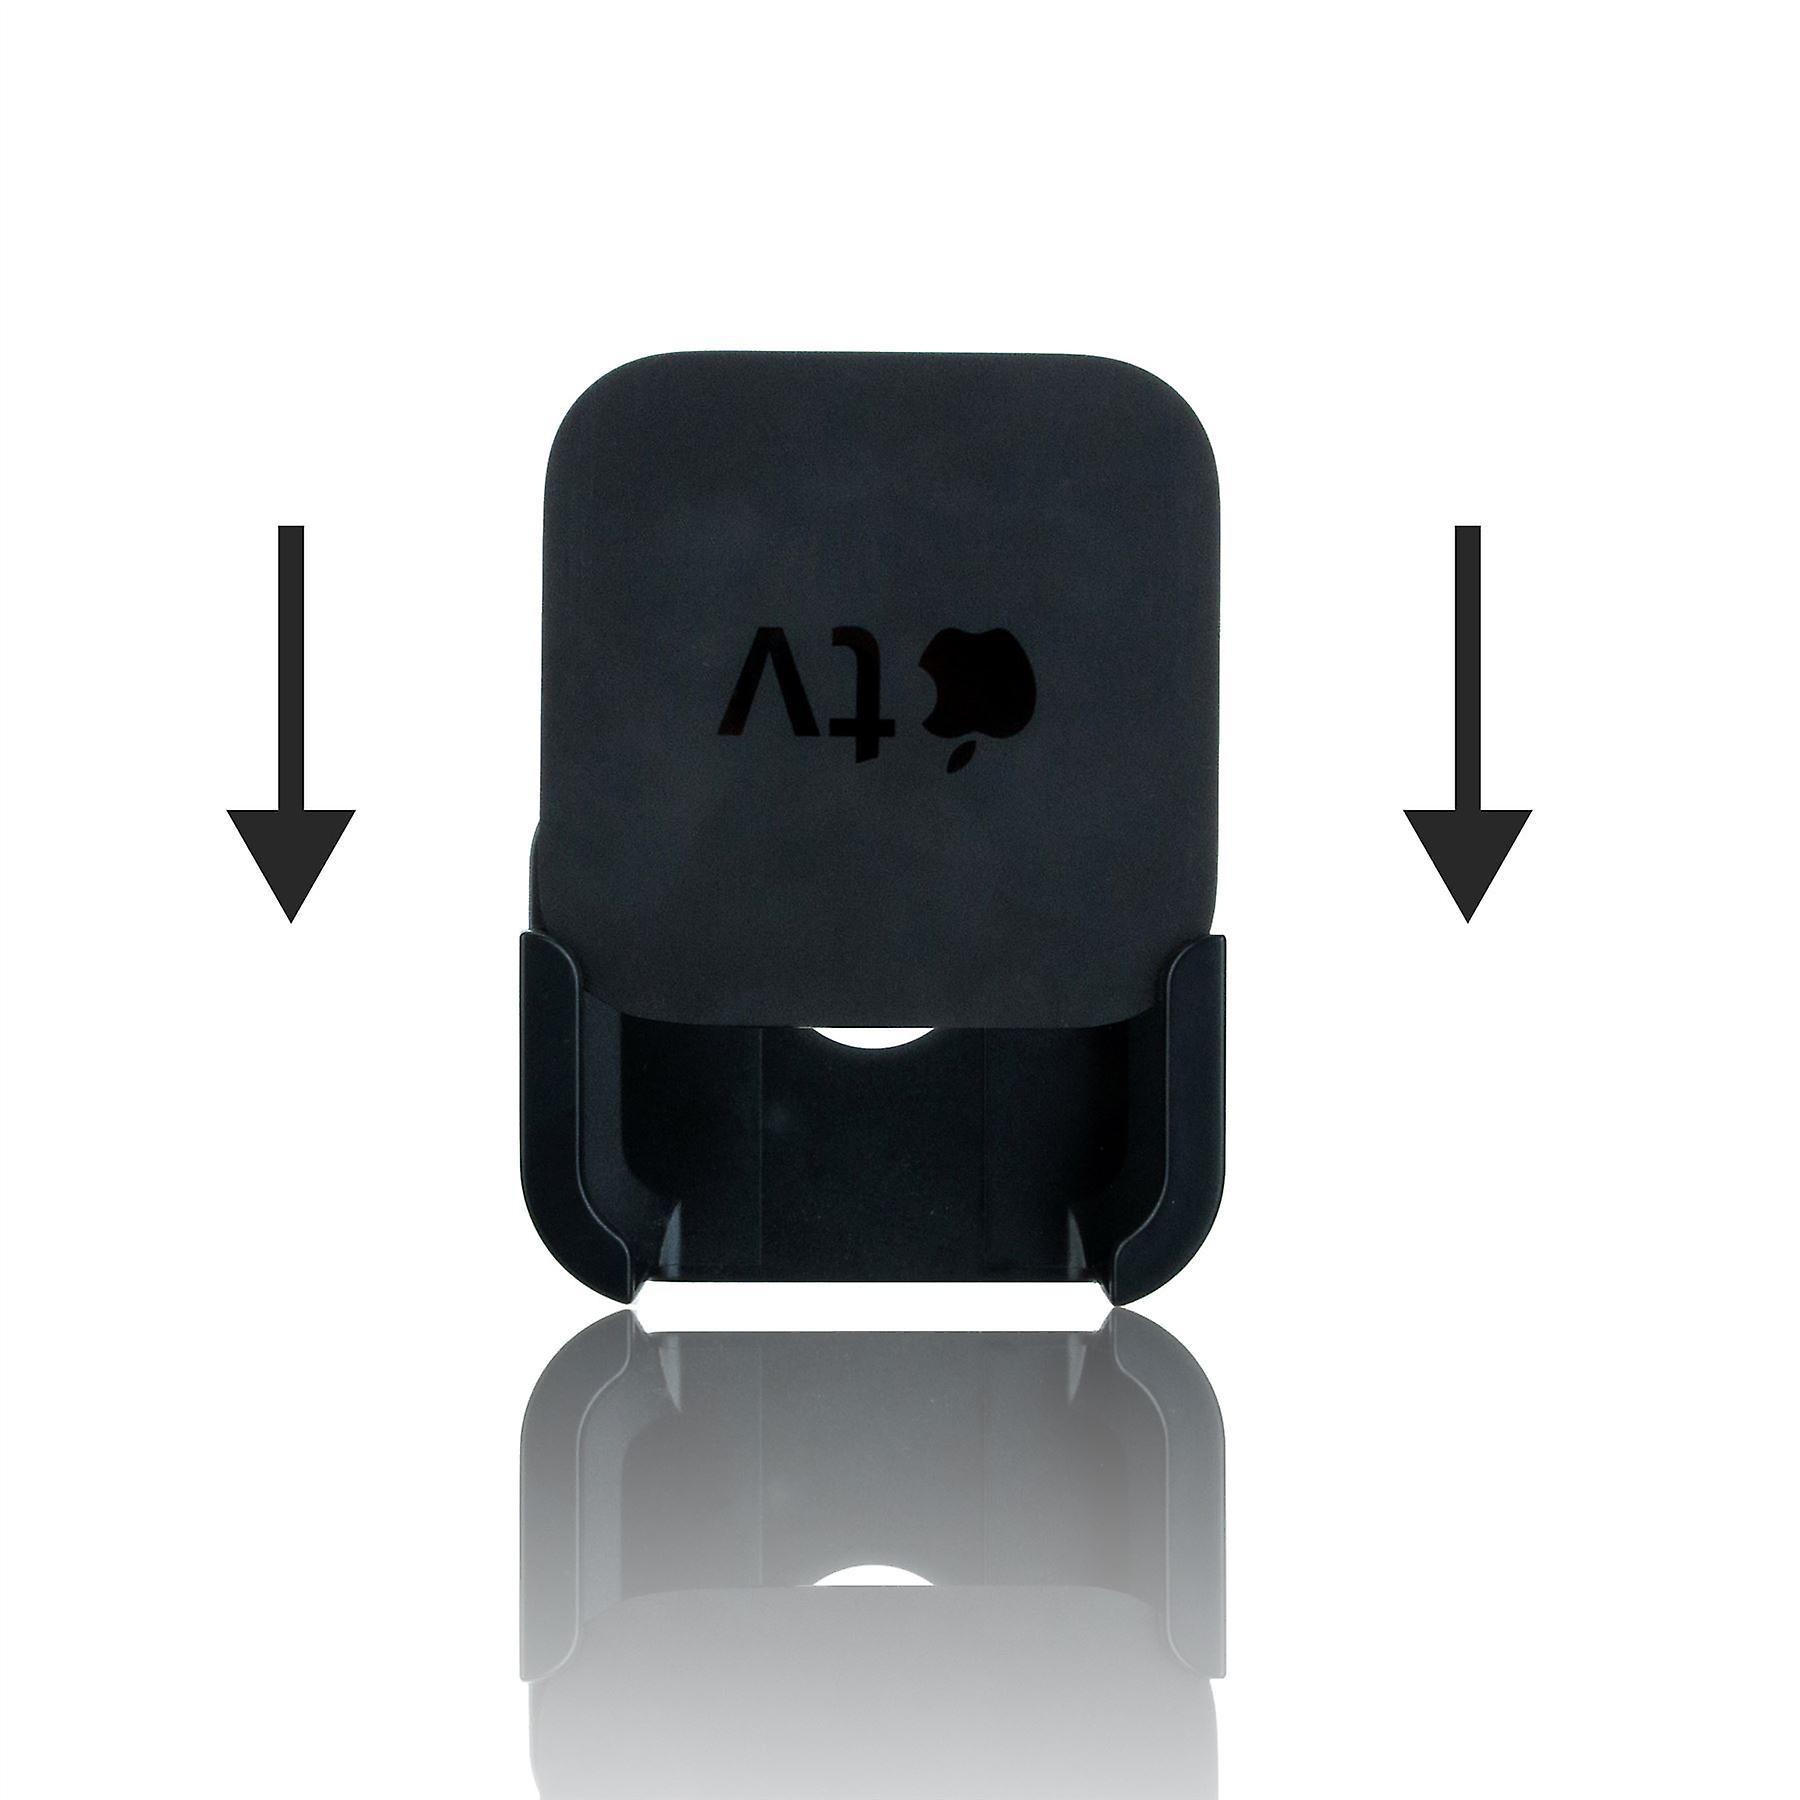 InventCase TV Mount Bracket Holder Wall Hanging Mounting Kit for Apple TV (4th Generation, A1625) 2015 - Black